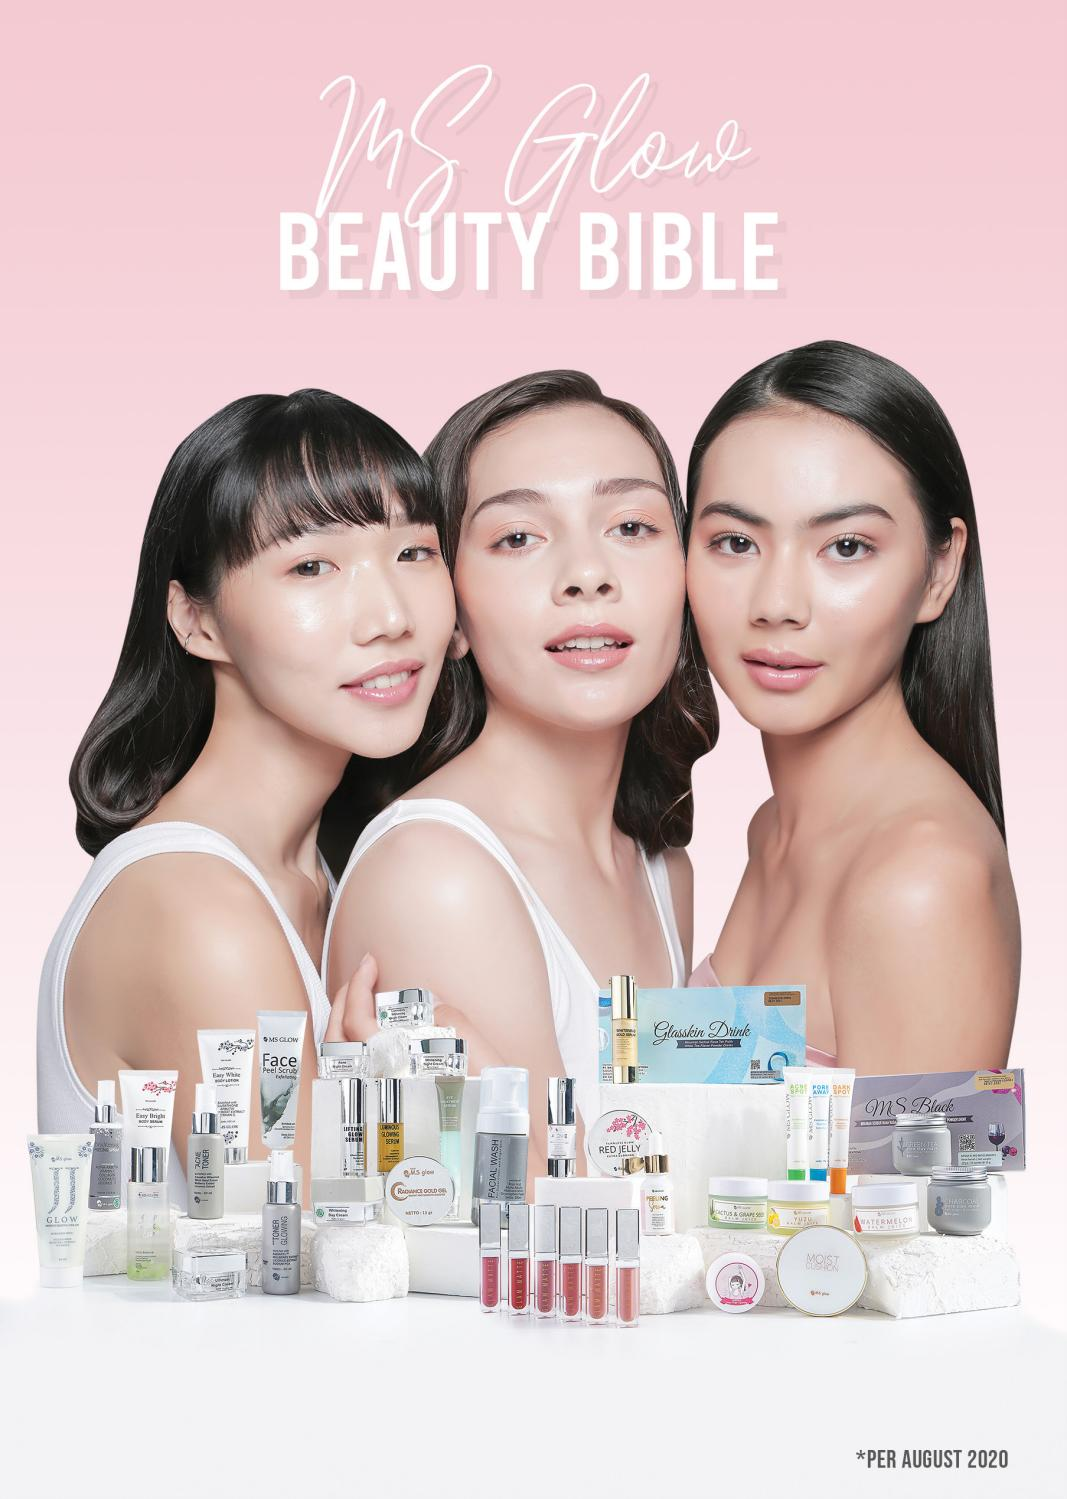 Katalog Ms Glow Beauty By Rizky Lia Nurlina Issuu